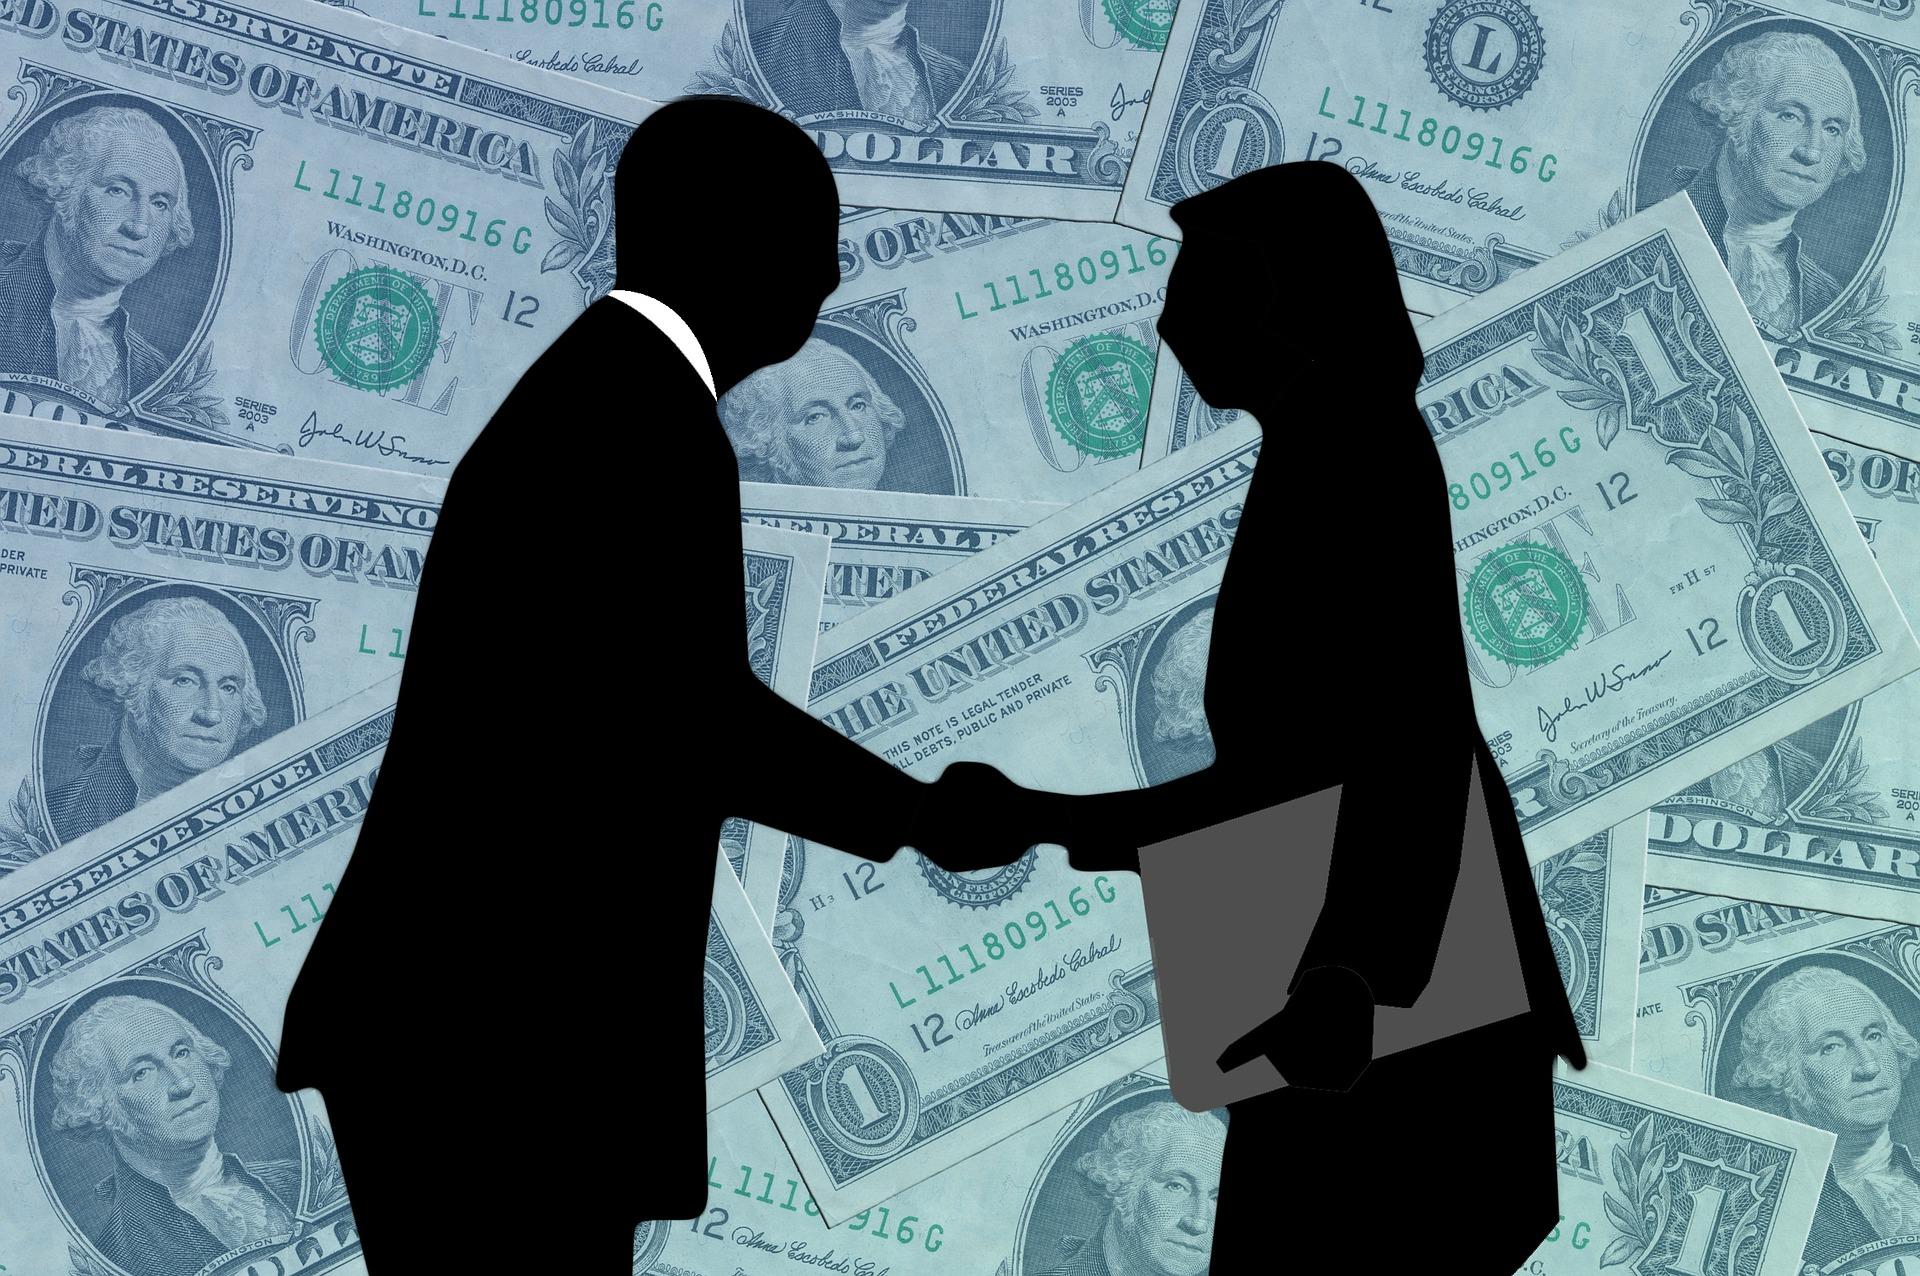 【M&Aインサイト】二段階買収案件の株式取得価格決定申立てに関する最高裁決定